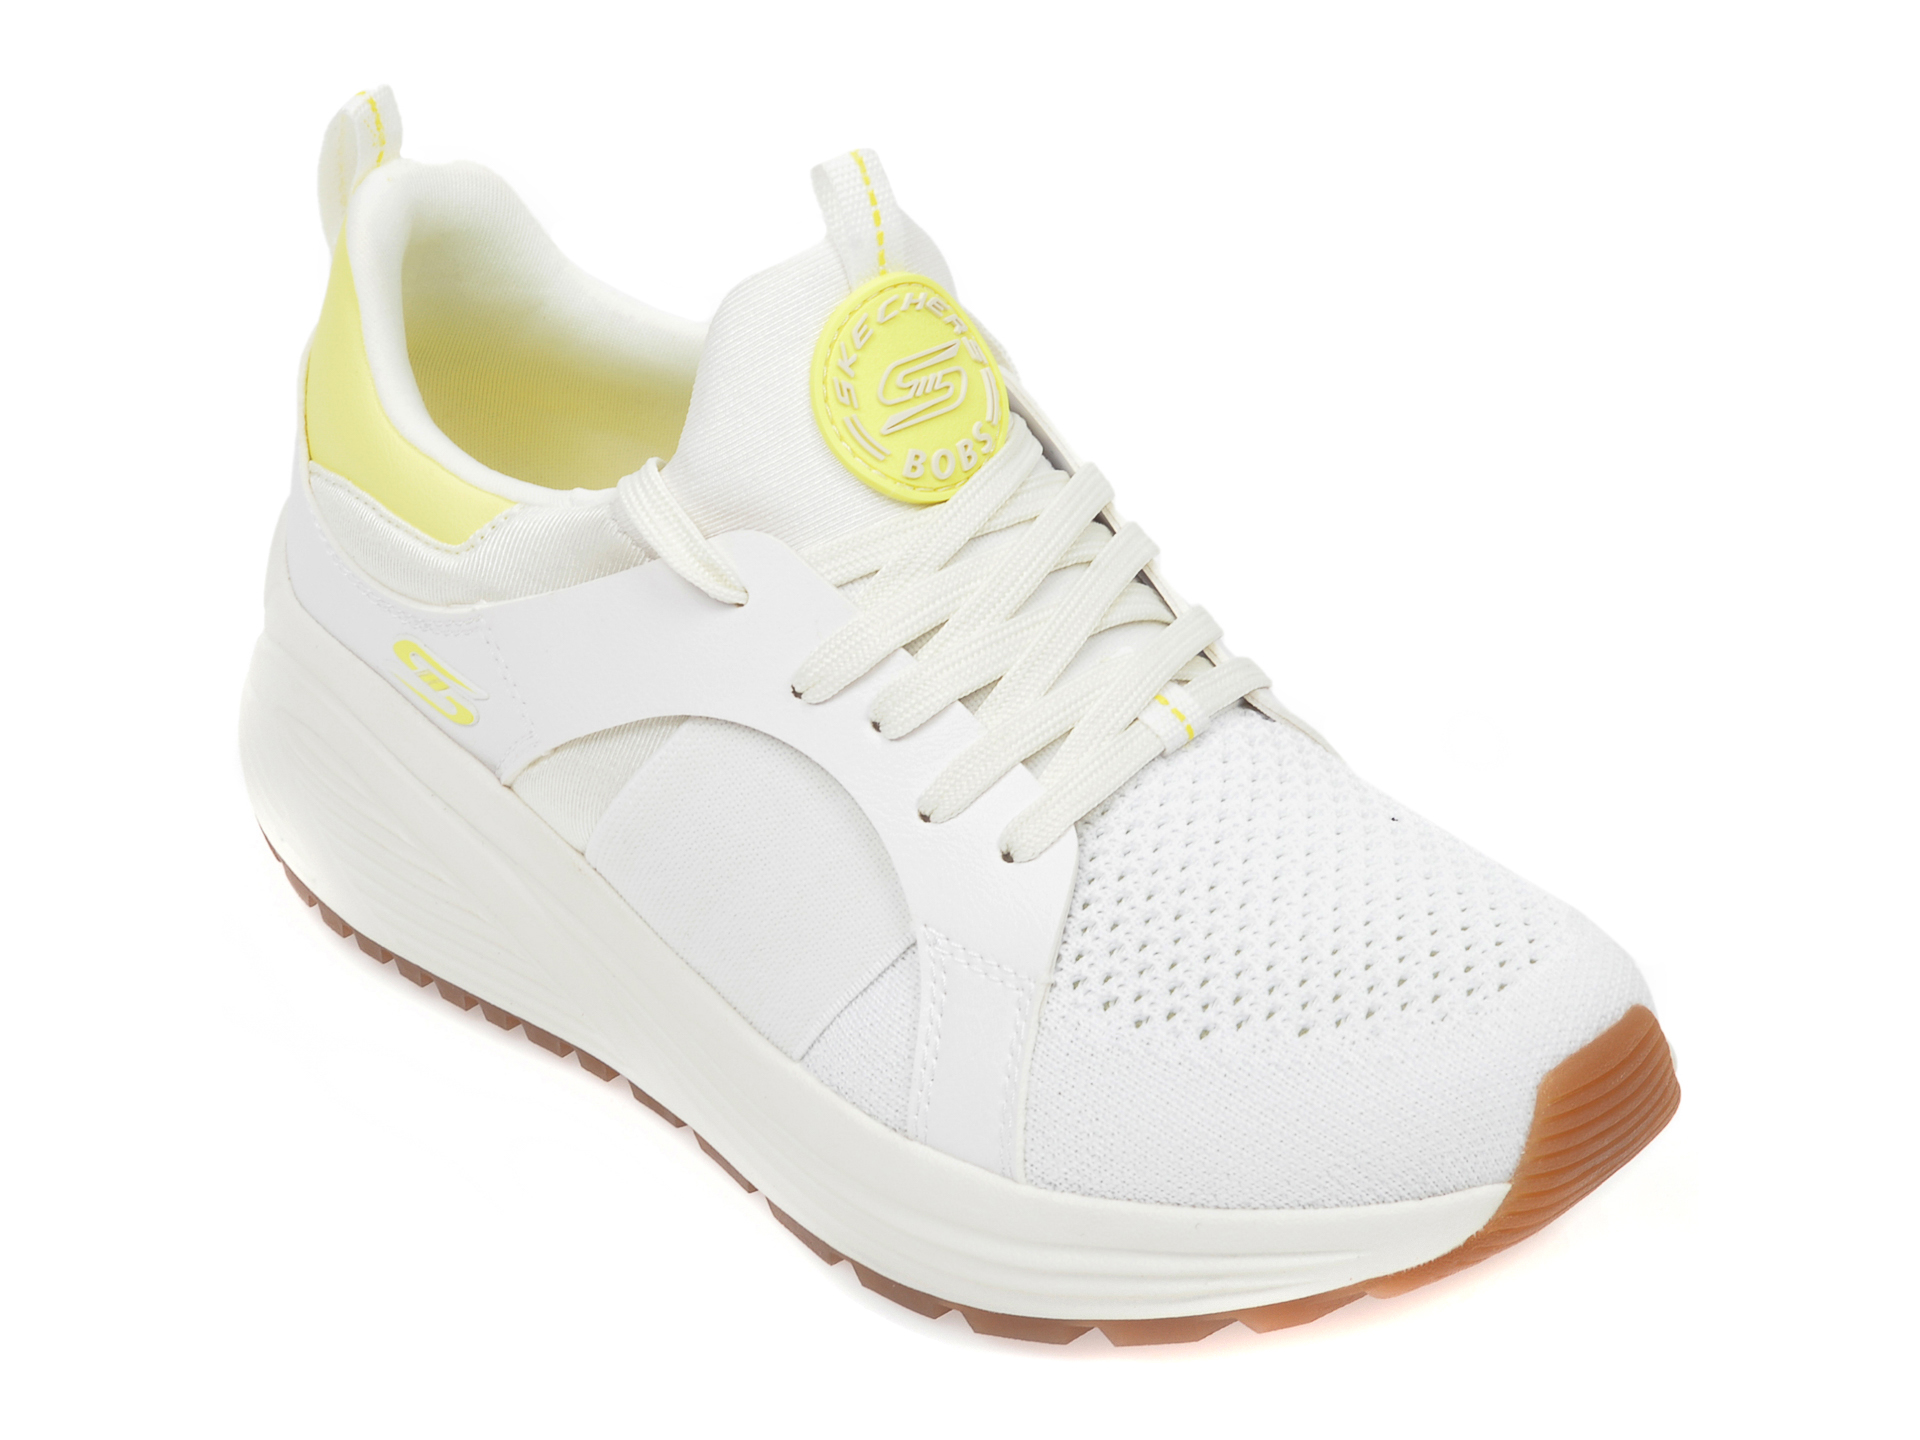 Pantofi sport SKECHERS albi, Bobs Sparrow 2.0 Metro Daisy, din material textil